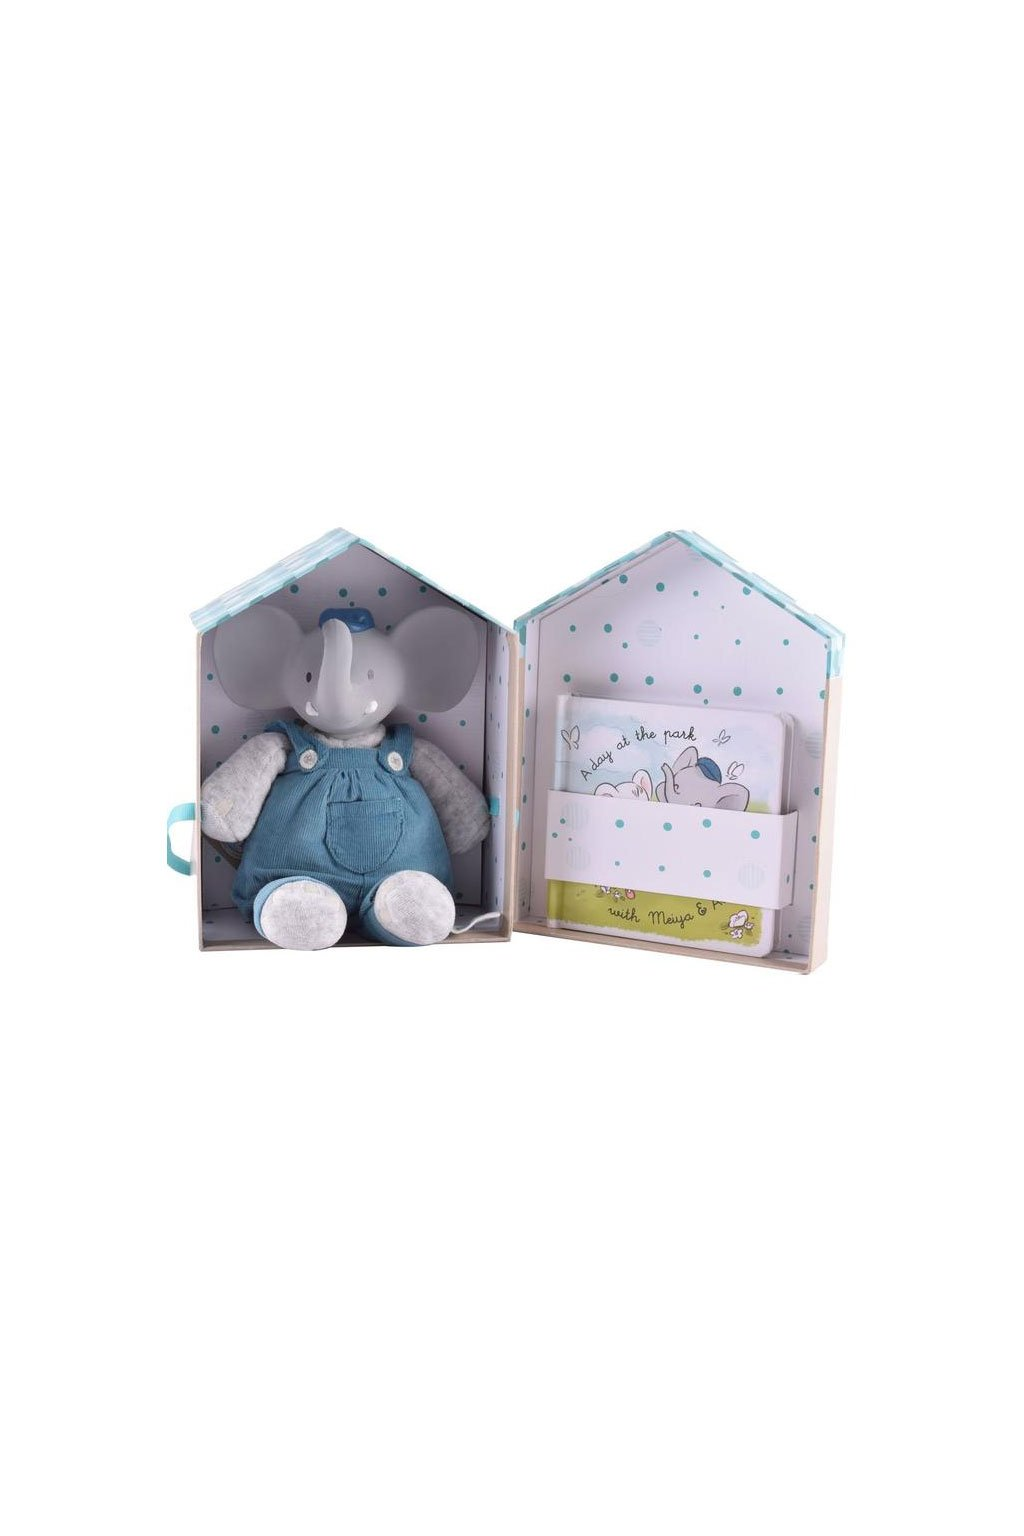 Darcekovy set DELUXE knizka hracka slonik alvin Meiya&Alvin